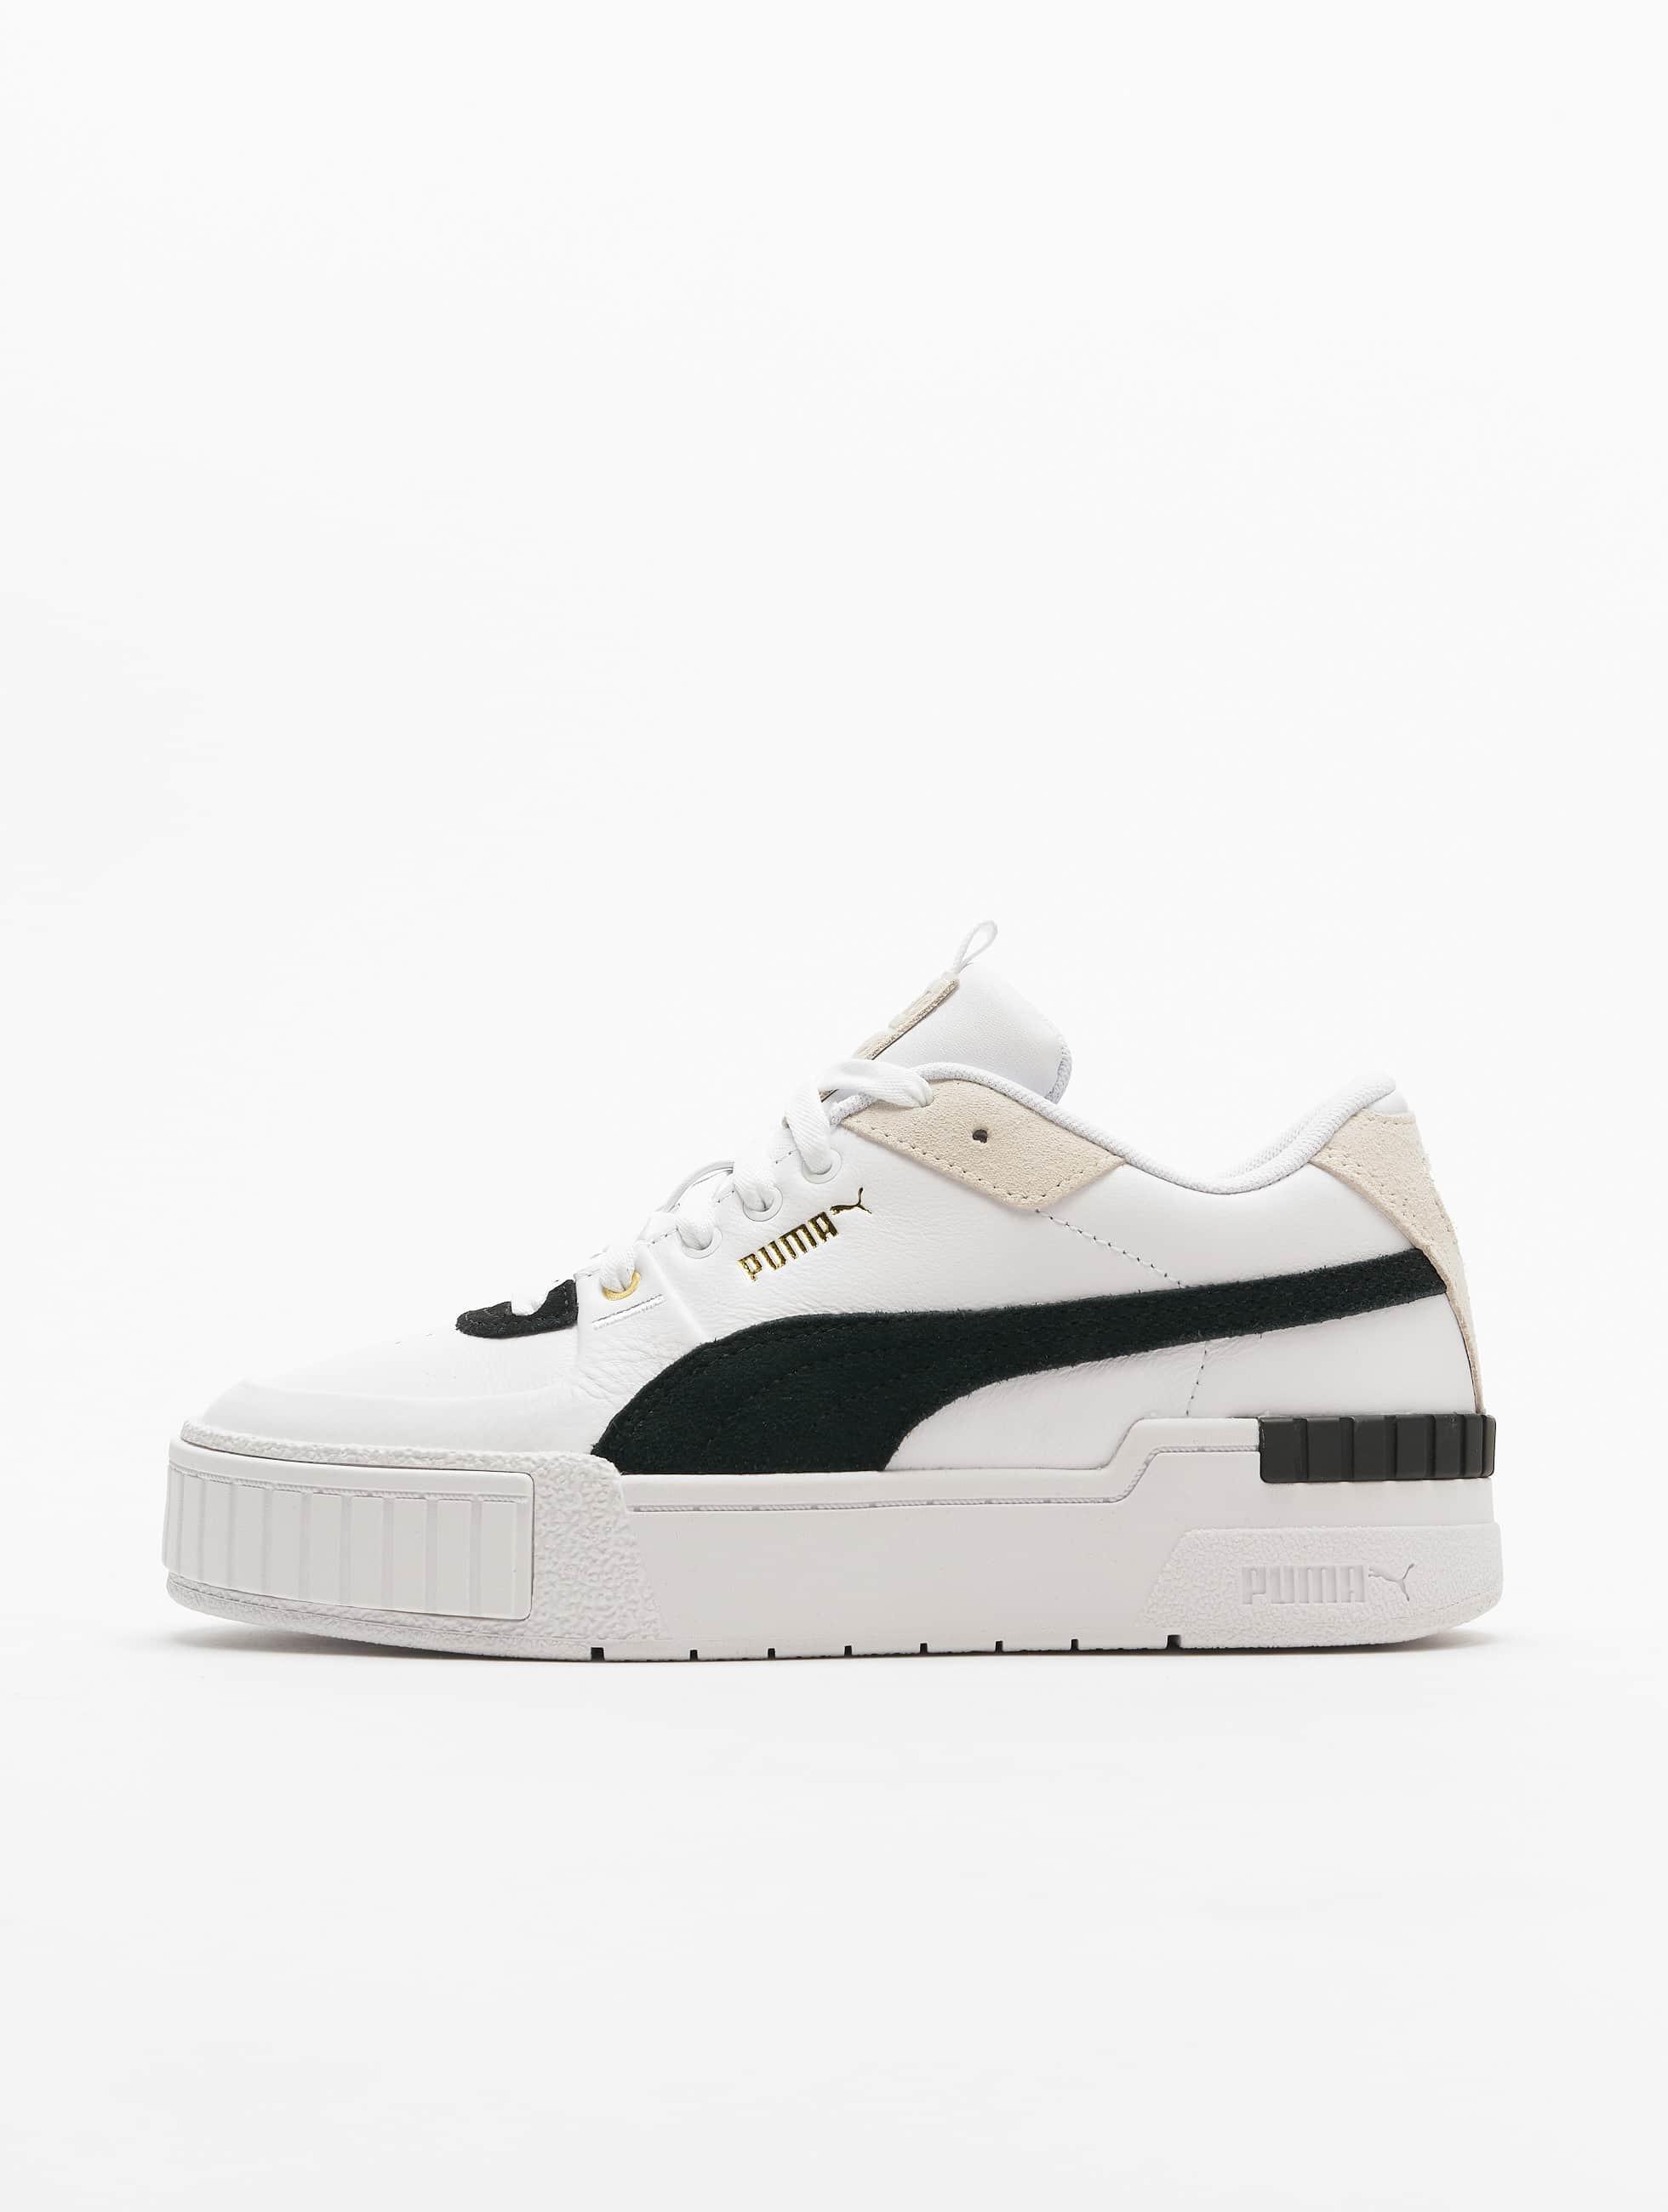 Puma Cali Sport Heritage Sneakers Puma White/Puma Black